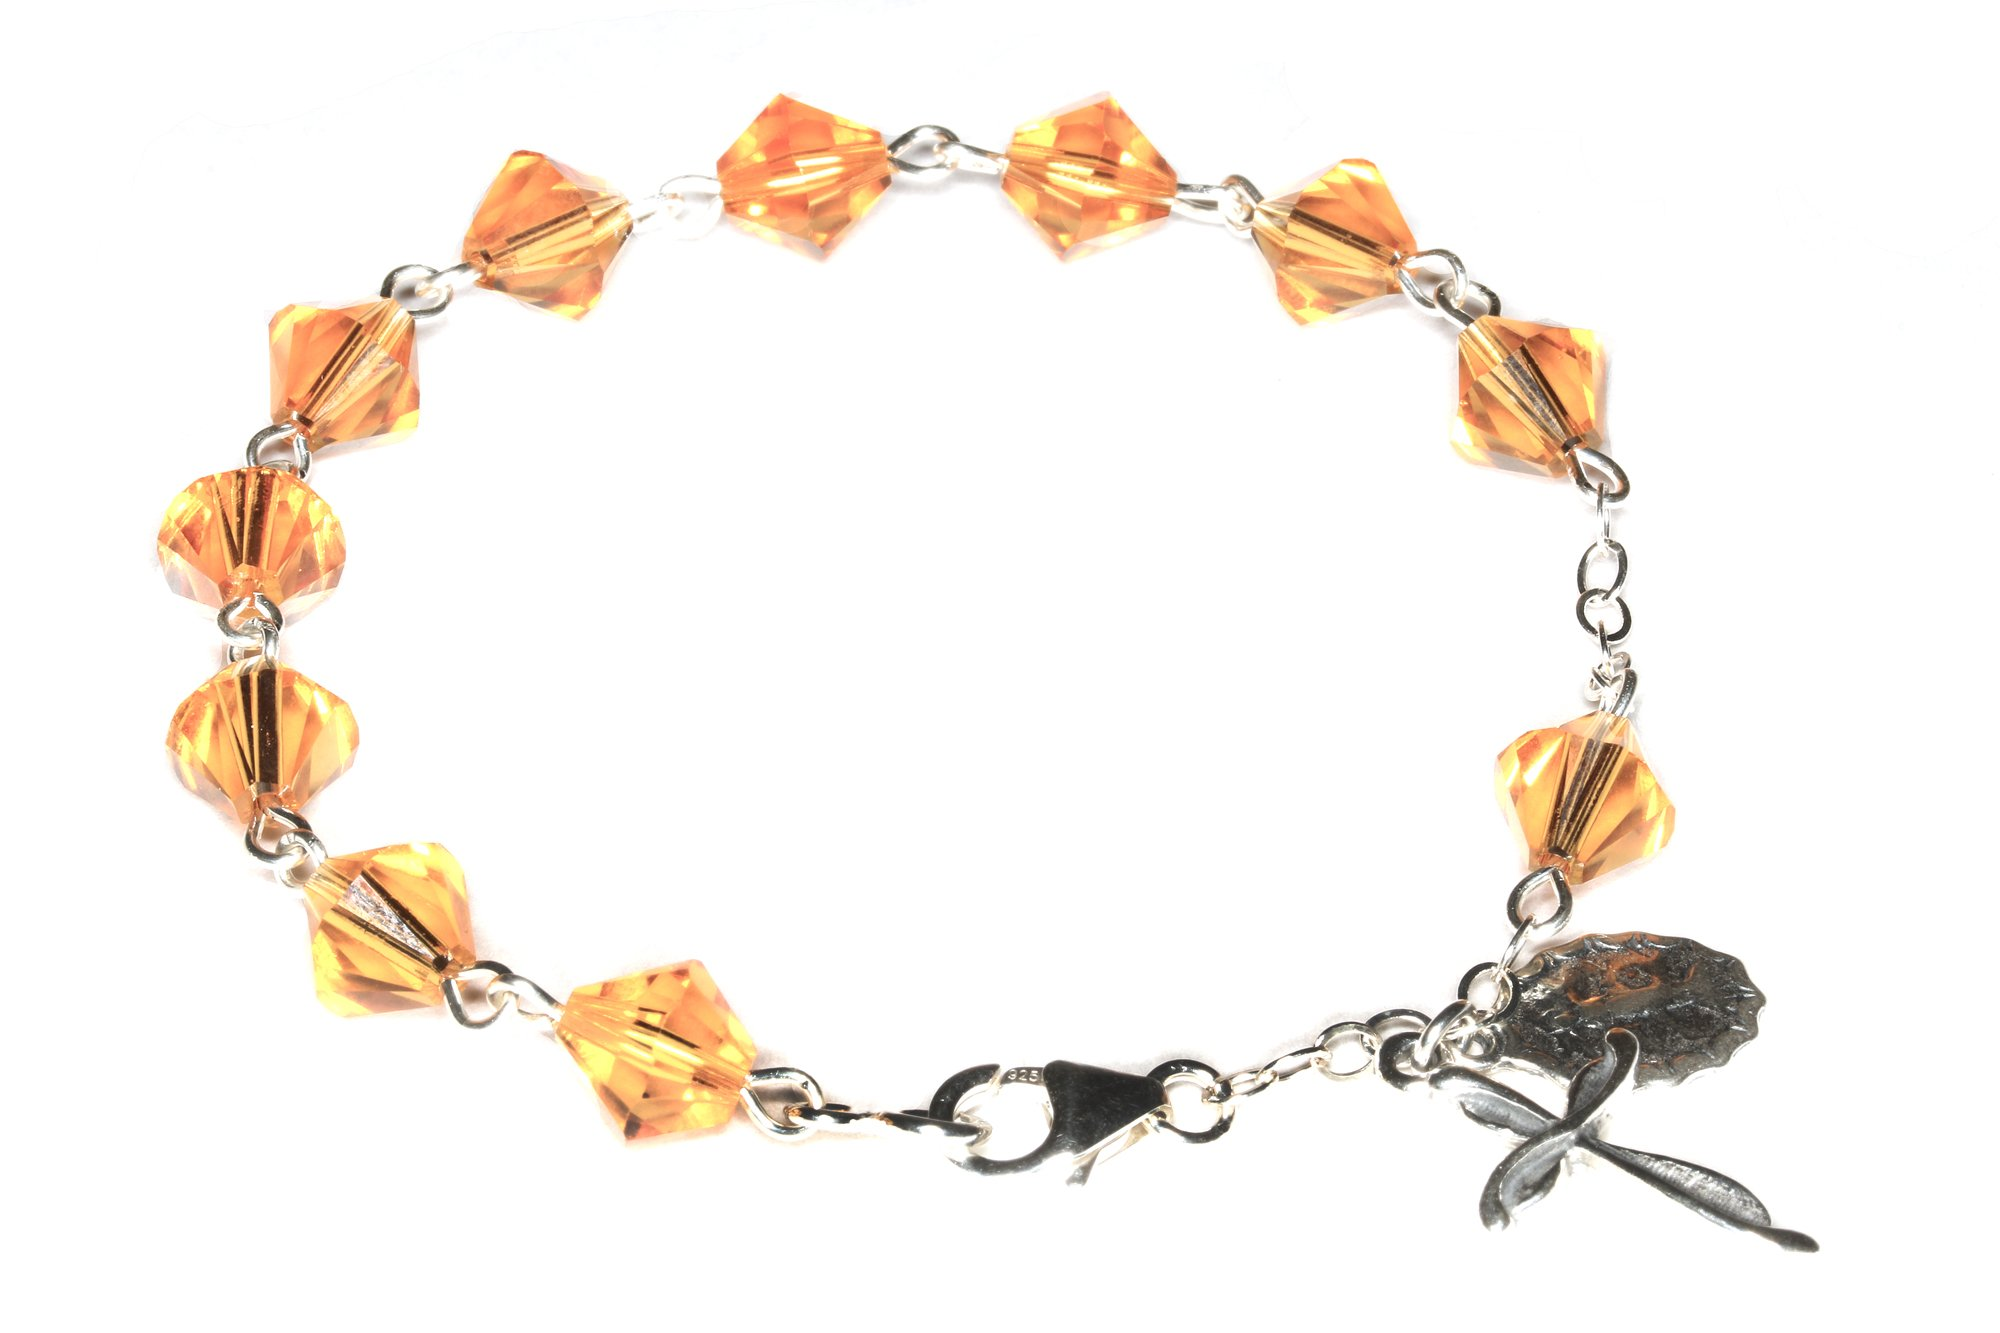 Womens Rosary Bracelet made with Topaz Brown Swarovski Crystal Elements (November)